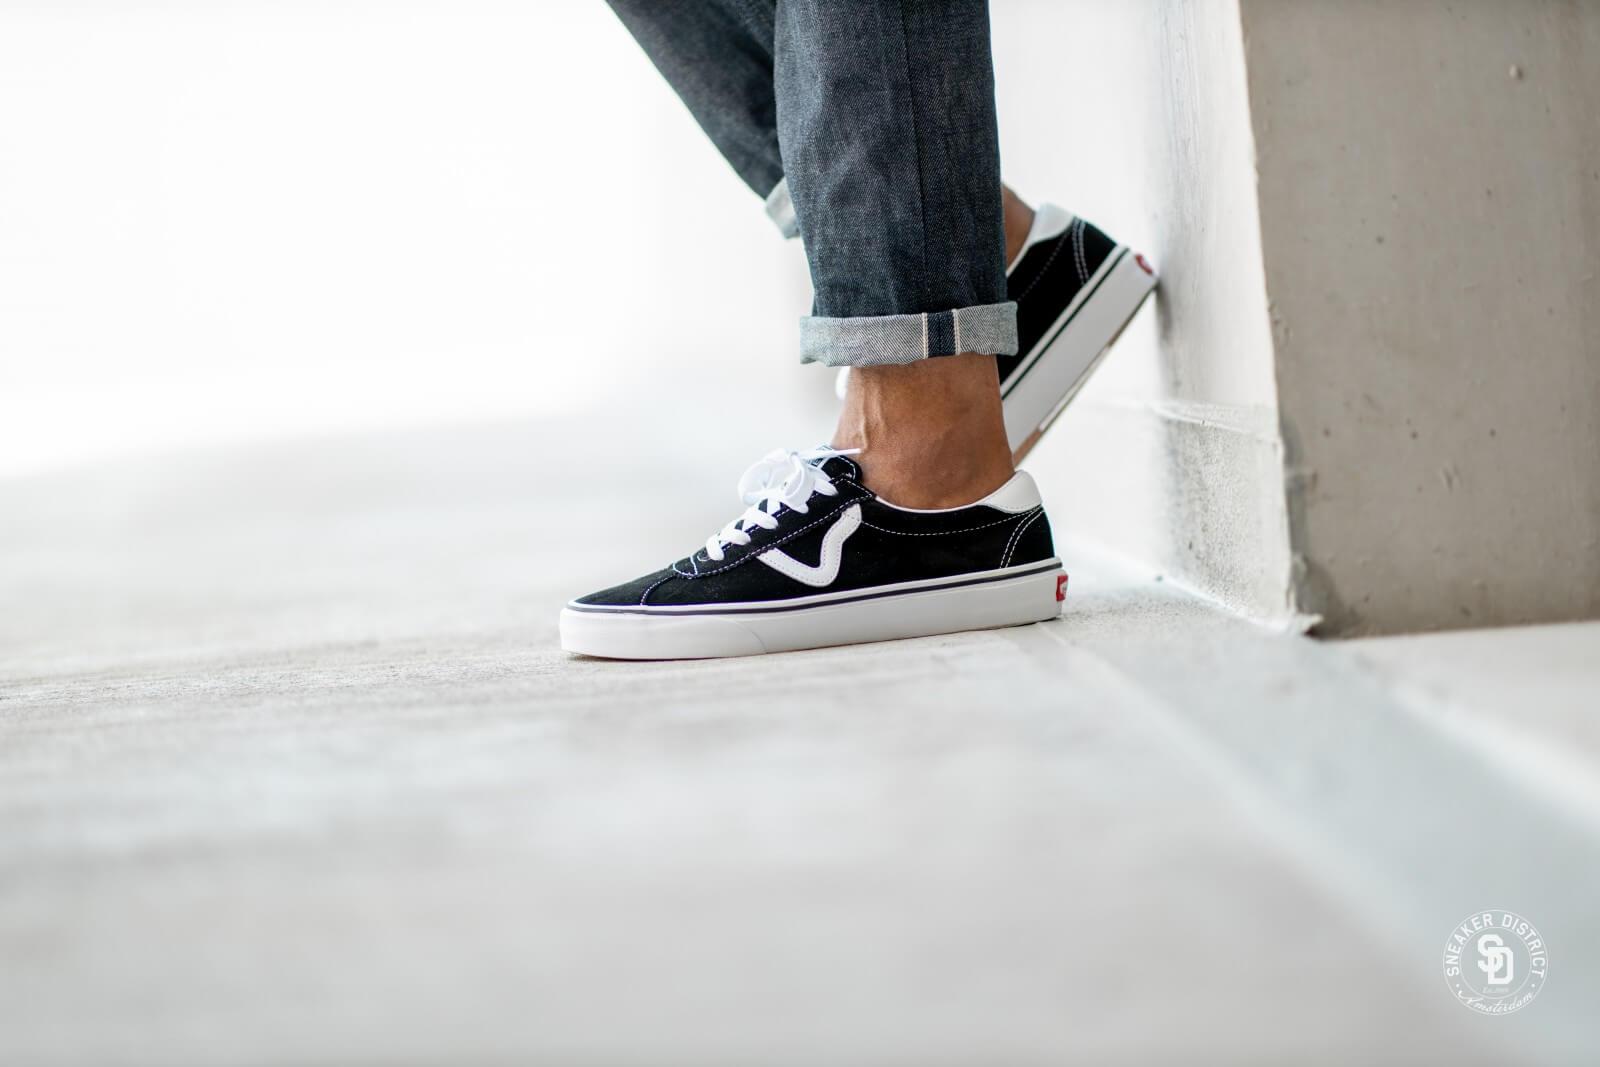 Vans Sport Suede Sneakers